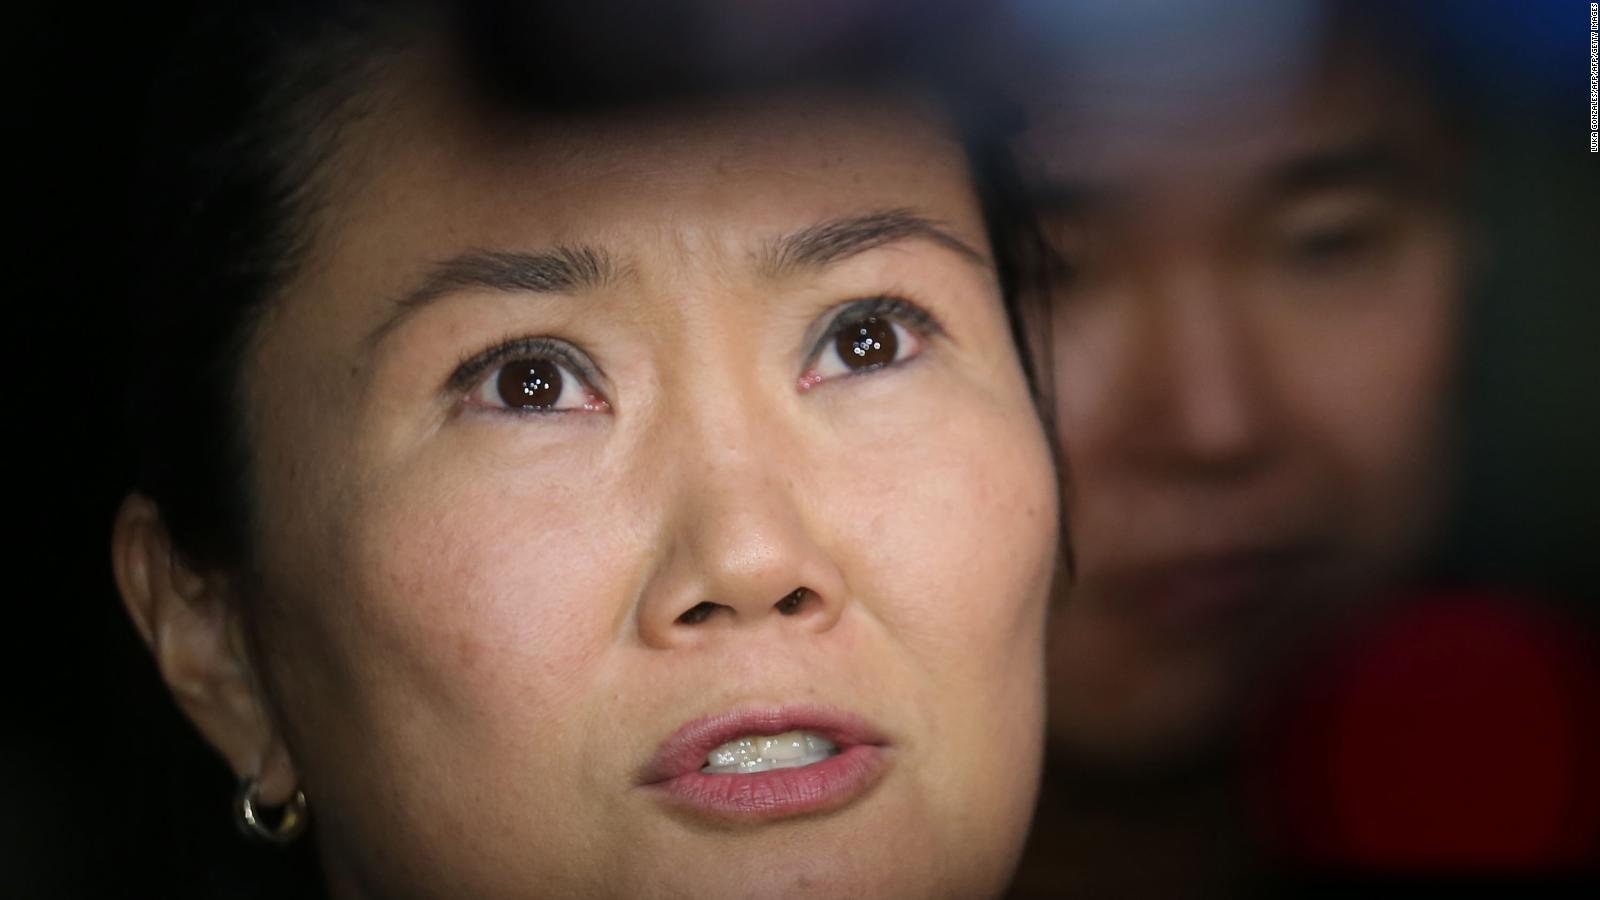 They are demanding detention from Odibrekt Fujimori